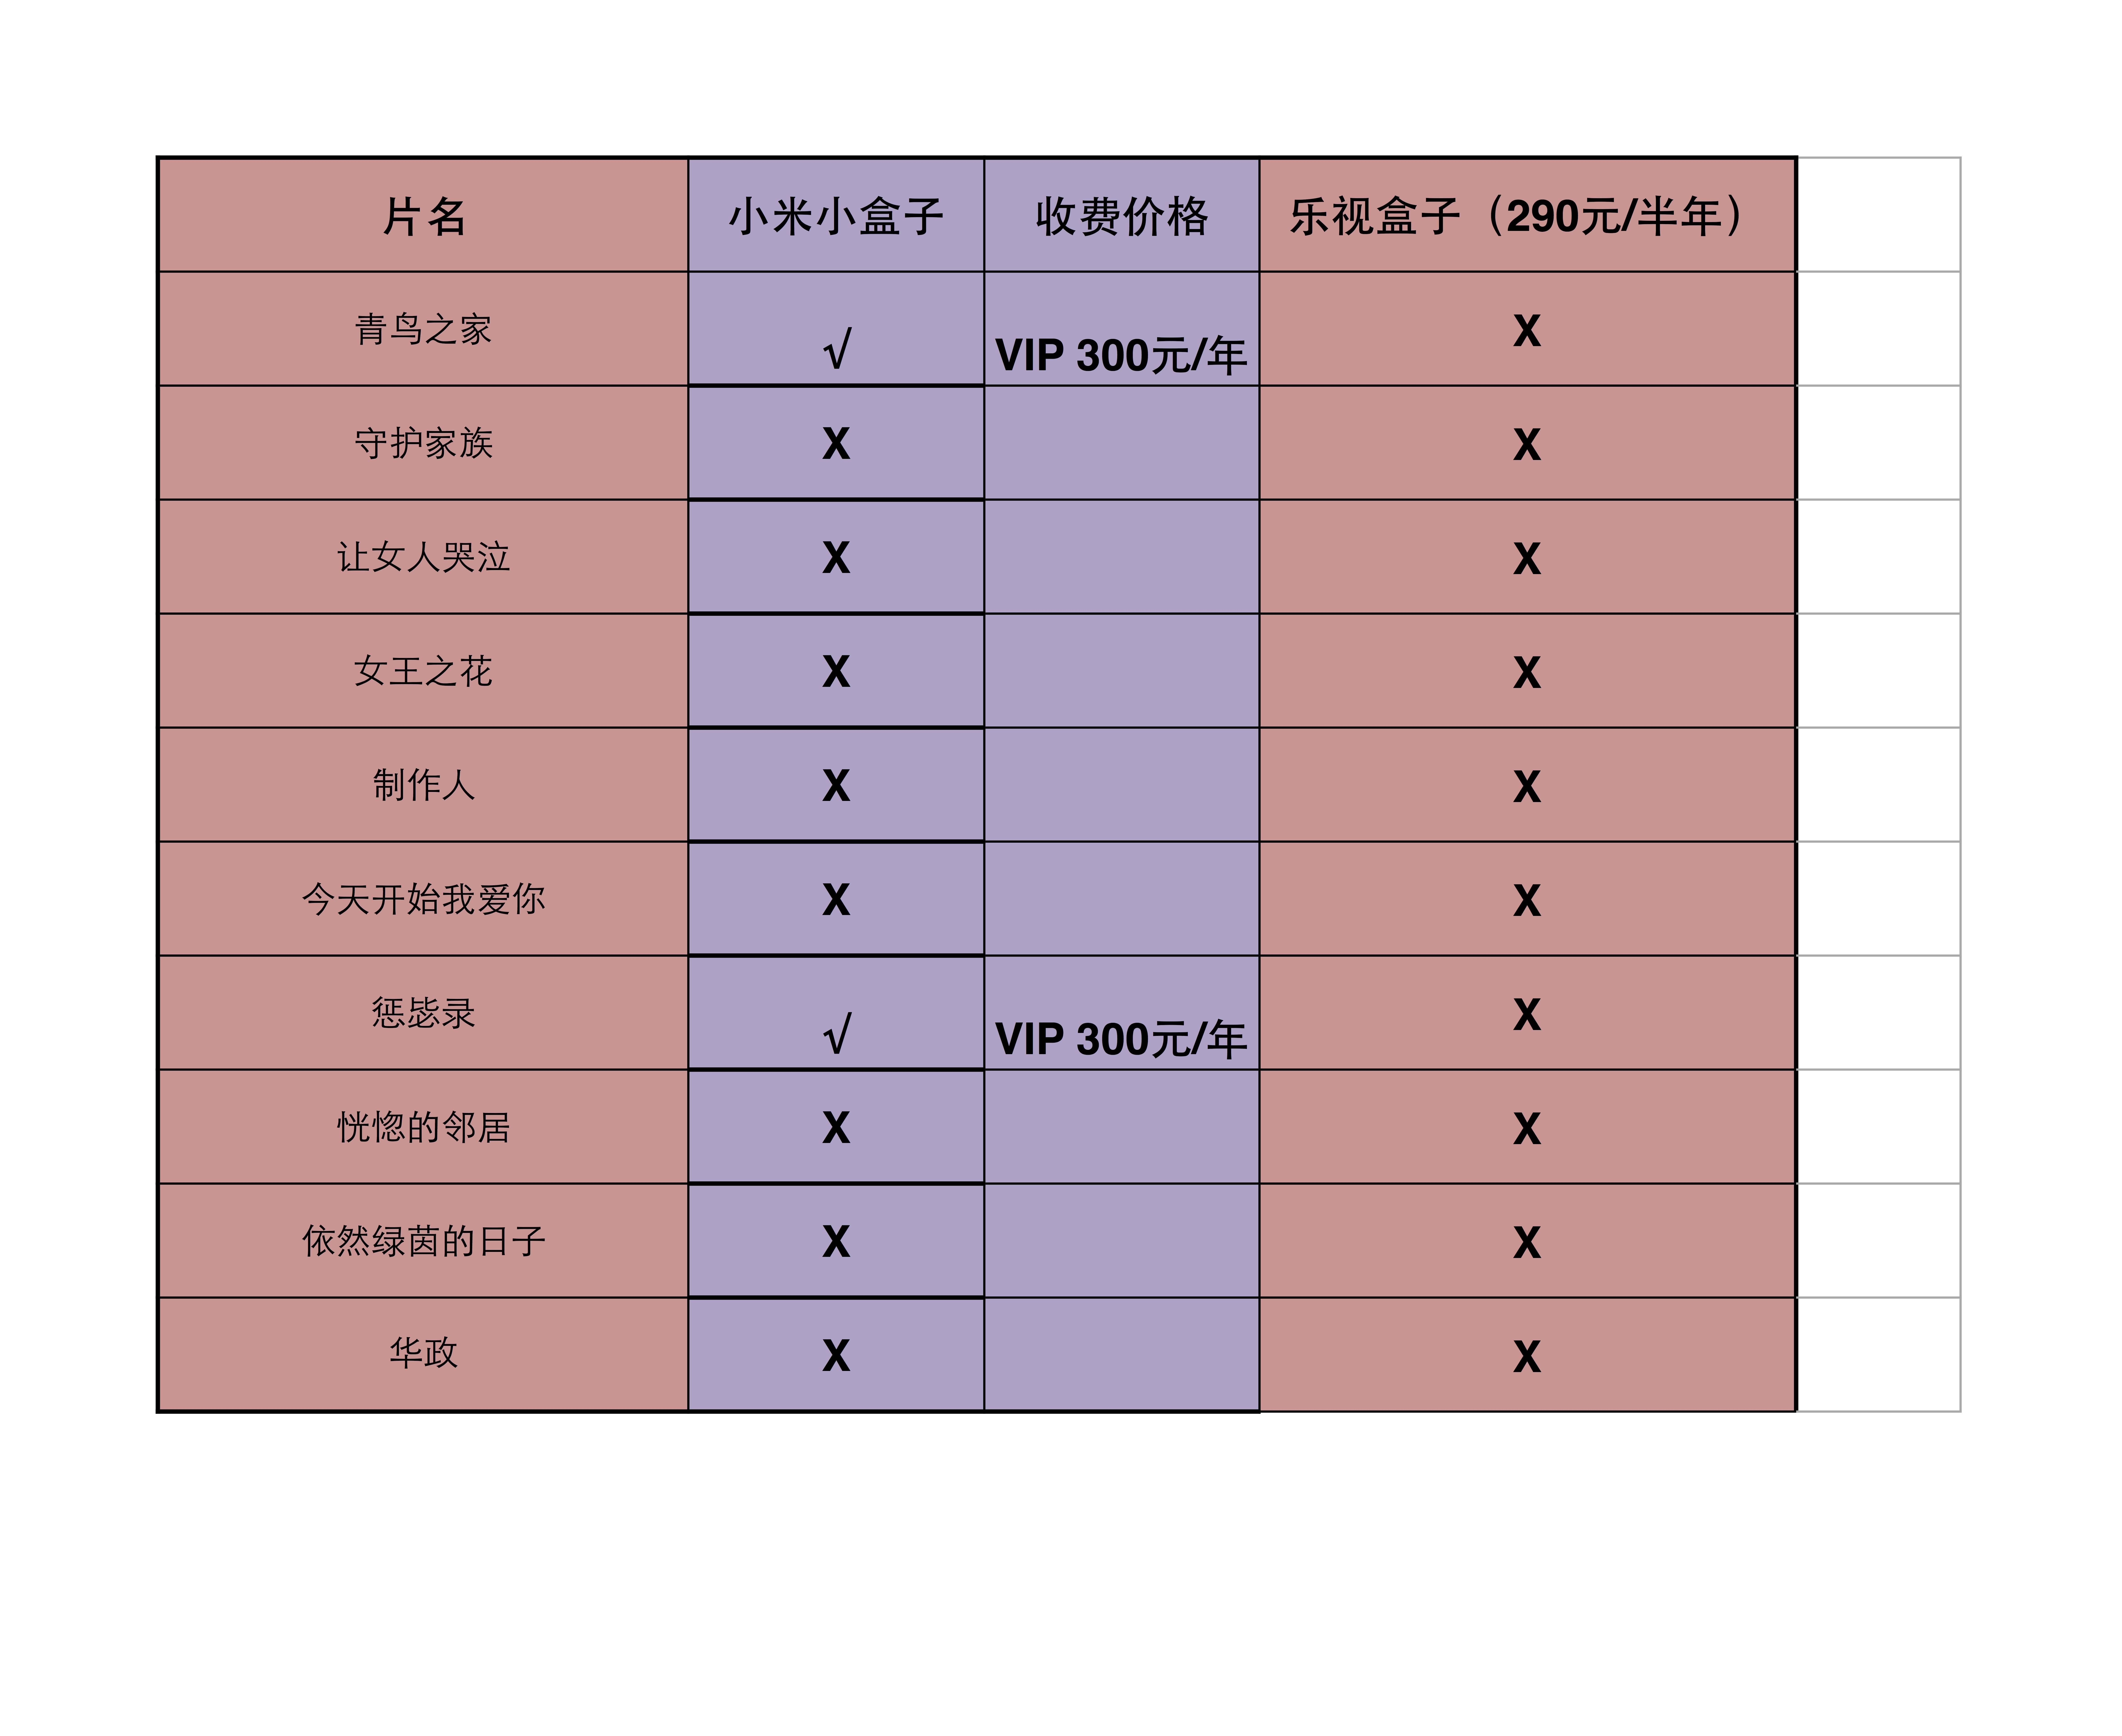 xiaomi-letv-who-is-best-2